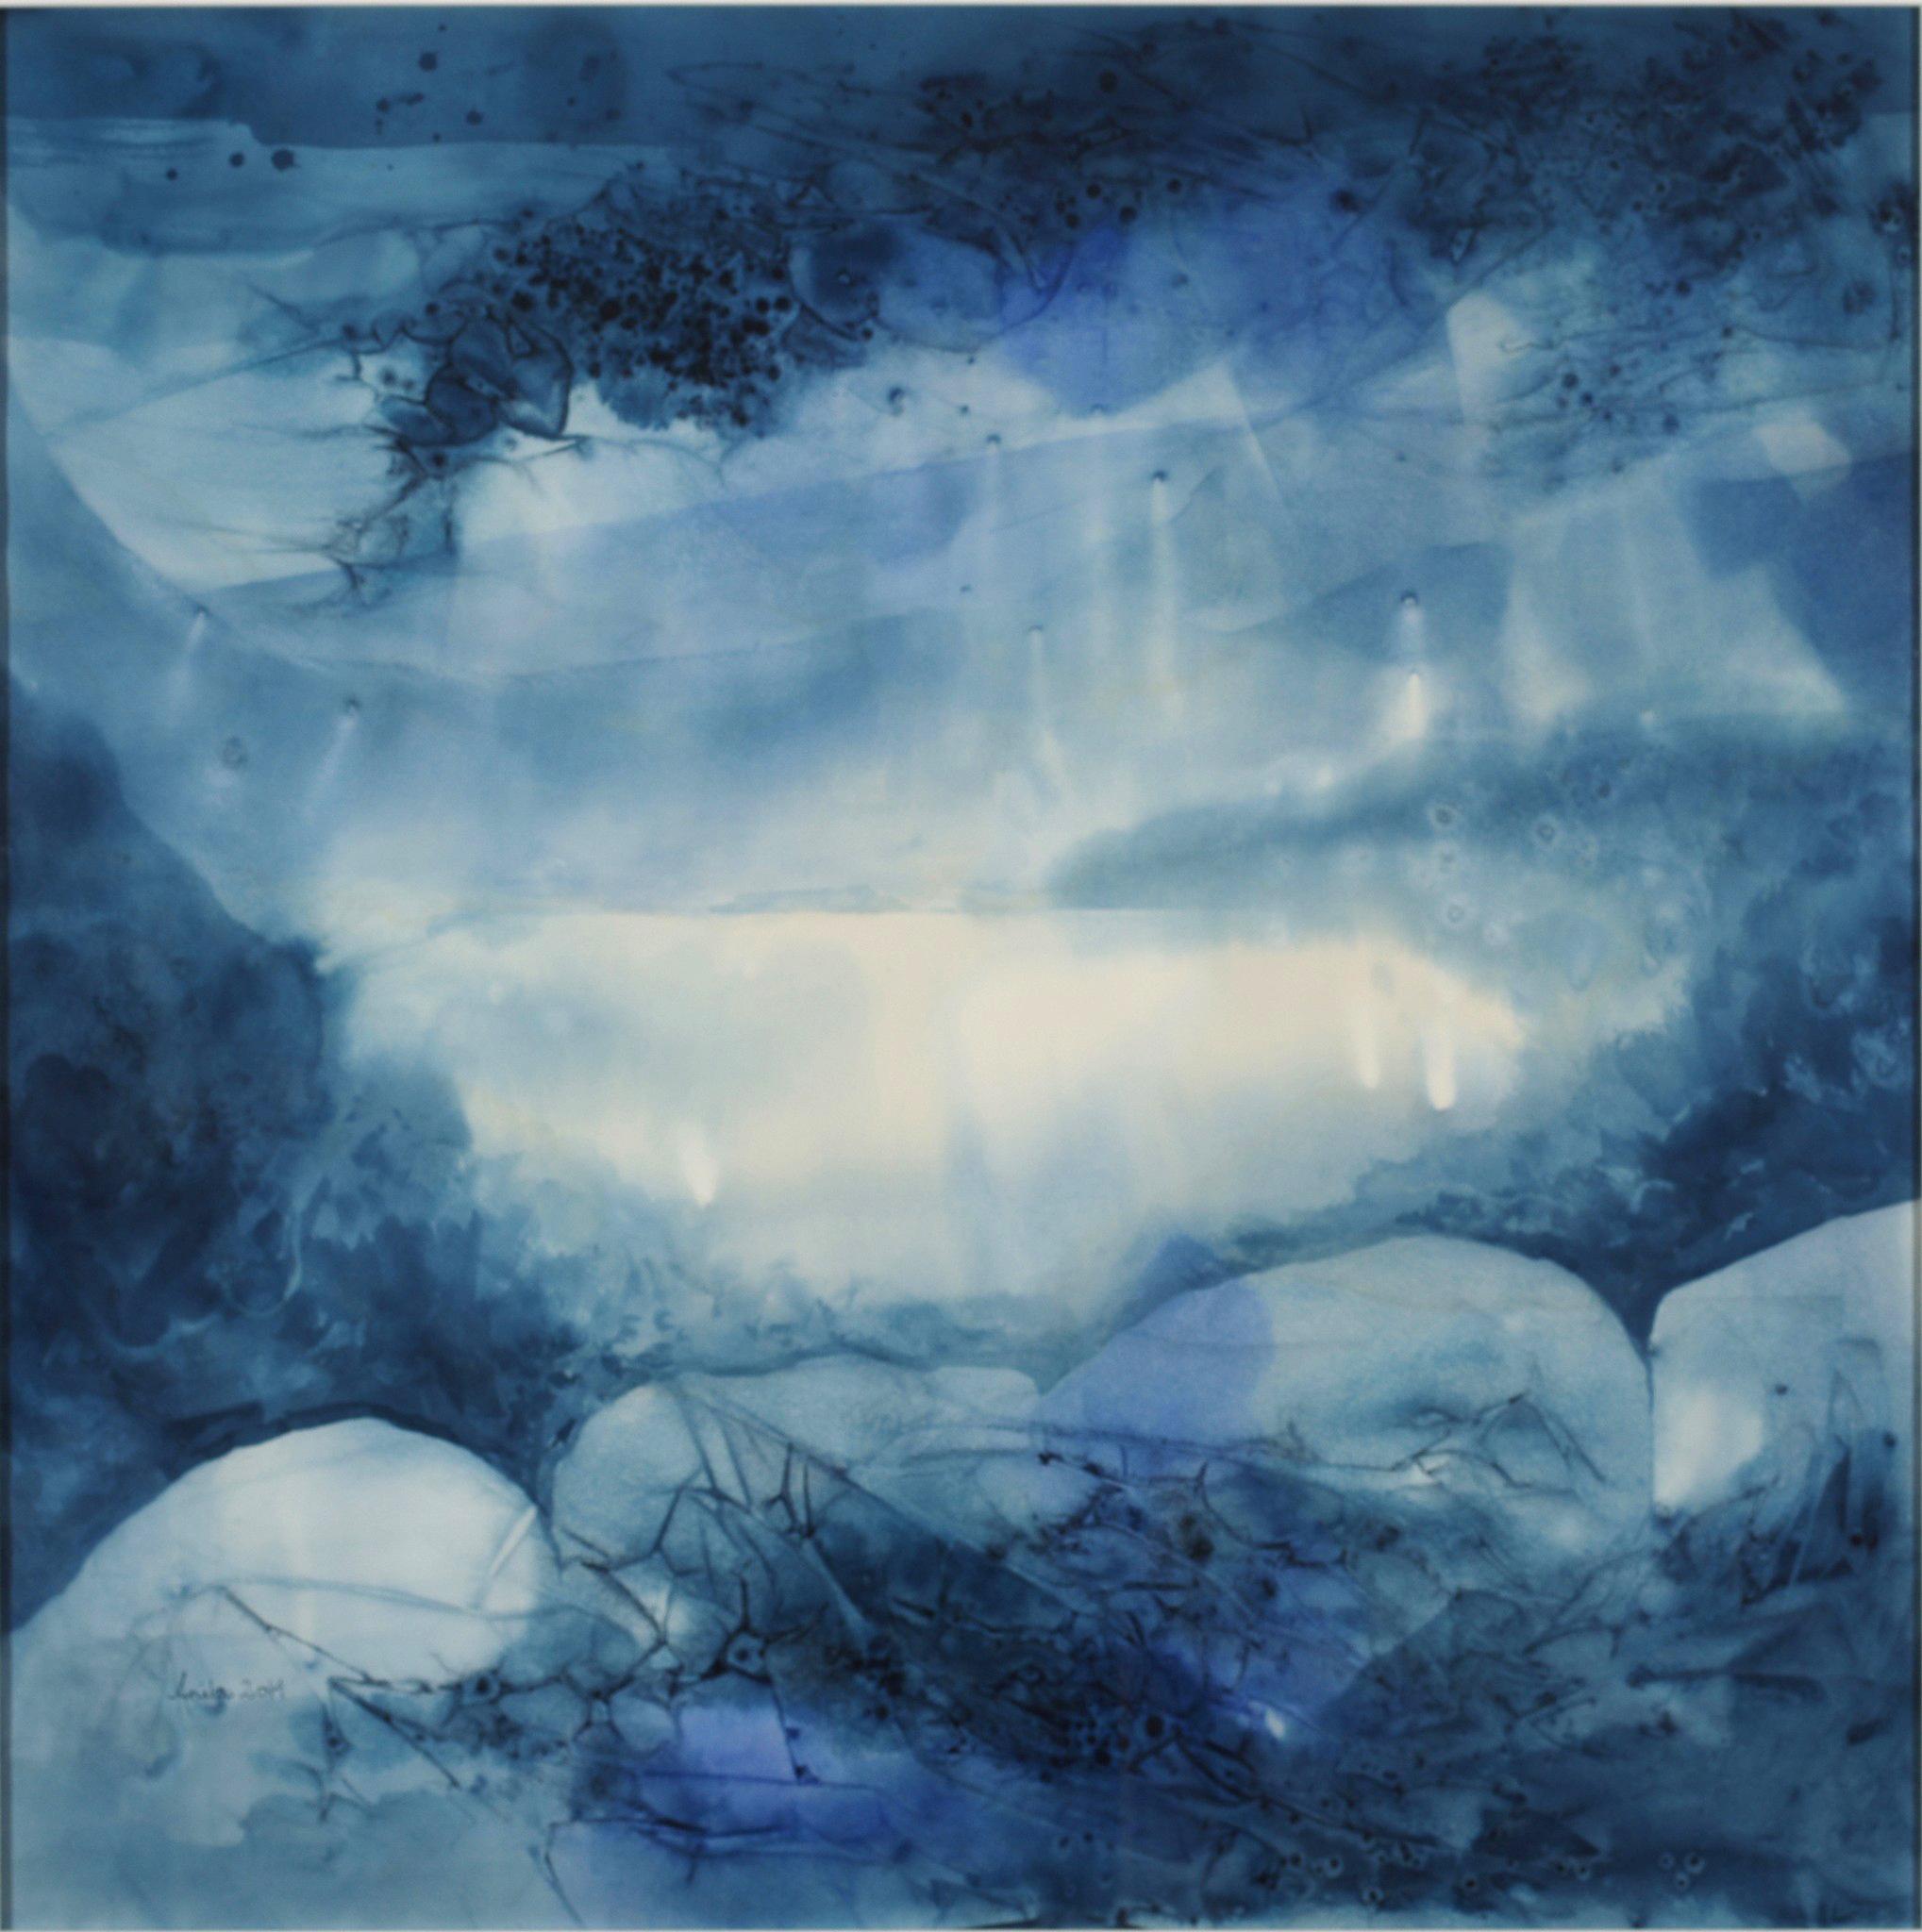 Winter I, 80x80cm, 2014